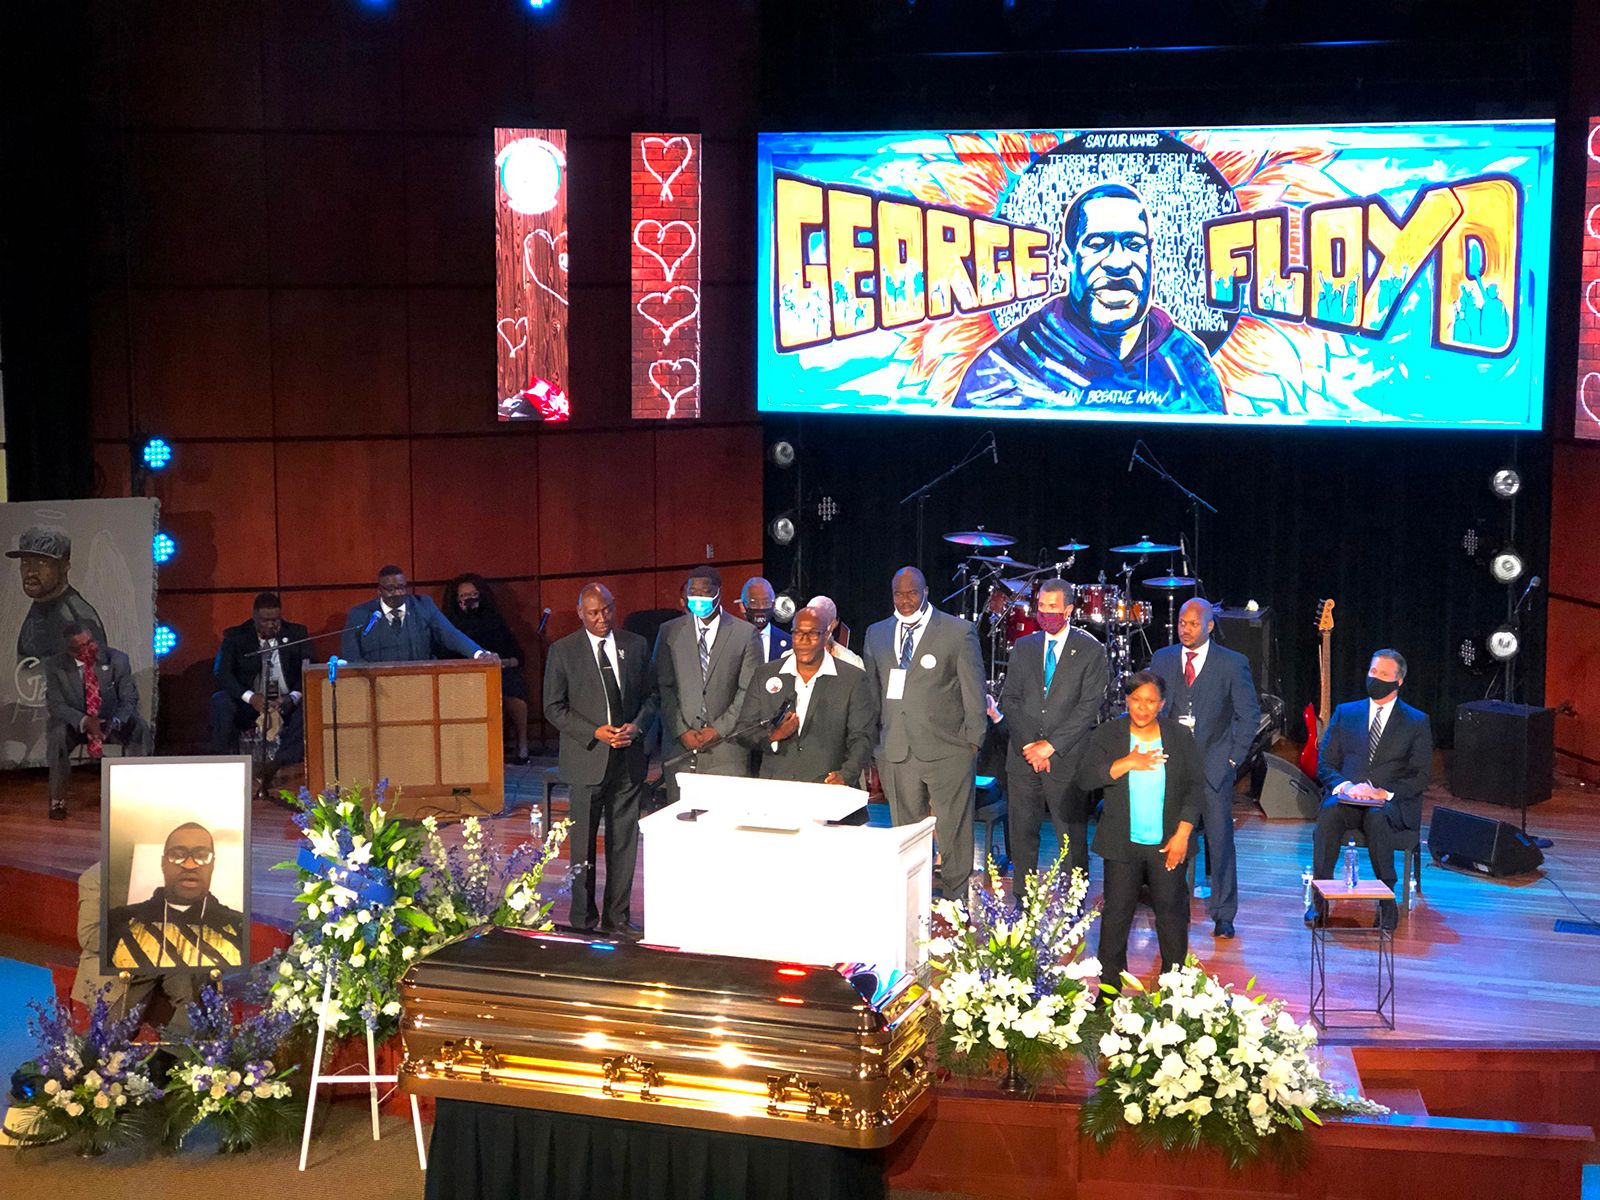 George Floyd's family speak during a memorial service for Floyd in Minneapolis, on June 4